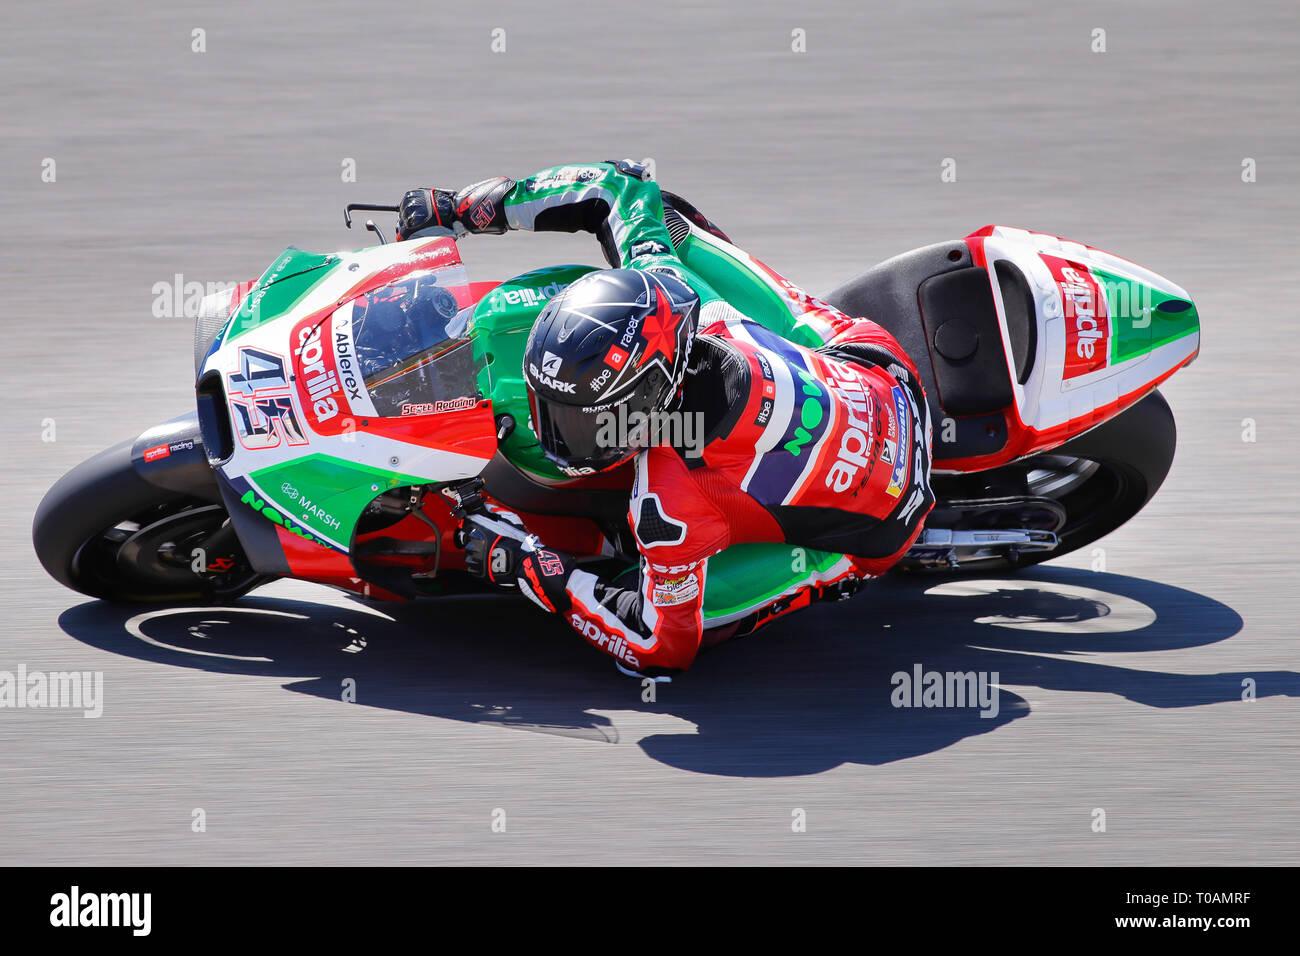 Scott Redding (GBR) of Aprilia Racing Team Gresini, MotoGP World Championship 2018, Pramac Motorrad Grand Prix Deutschland, Sachsenring, 14.07.2018 - Stock Image